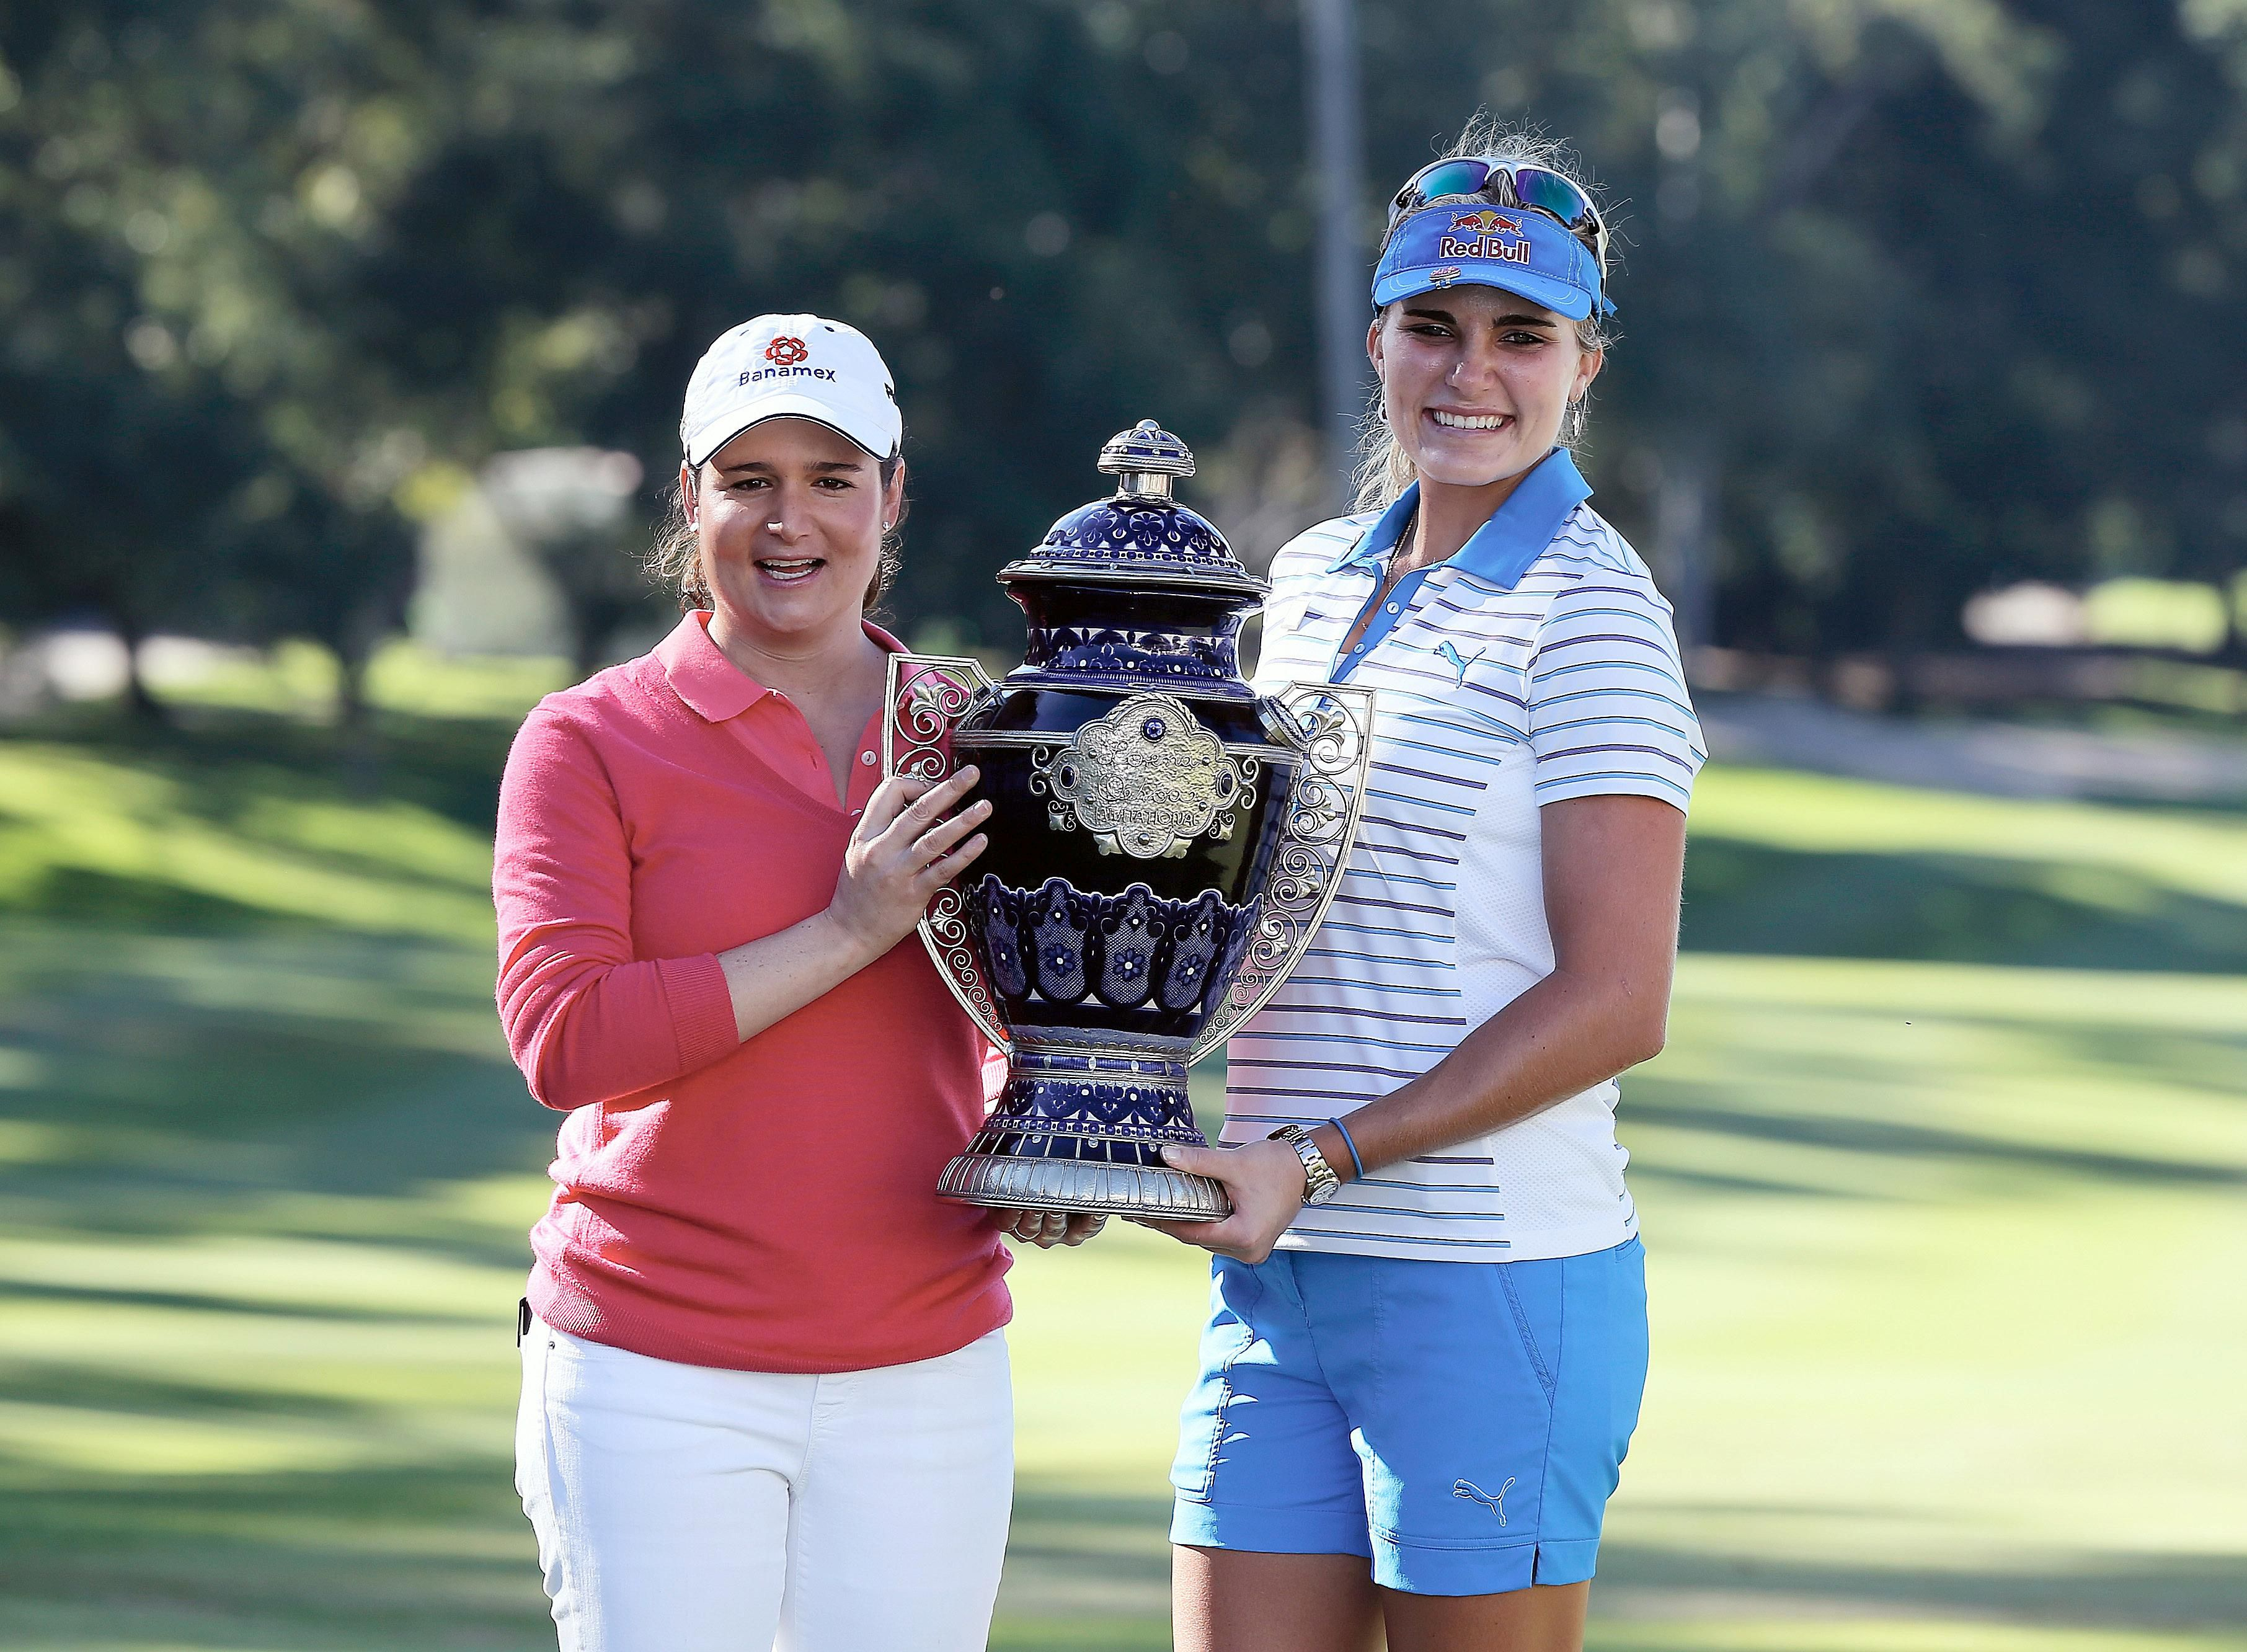 Lorena Ochoa Match Play Tournament On LPGA Tour